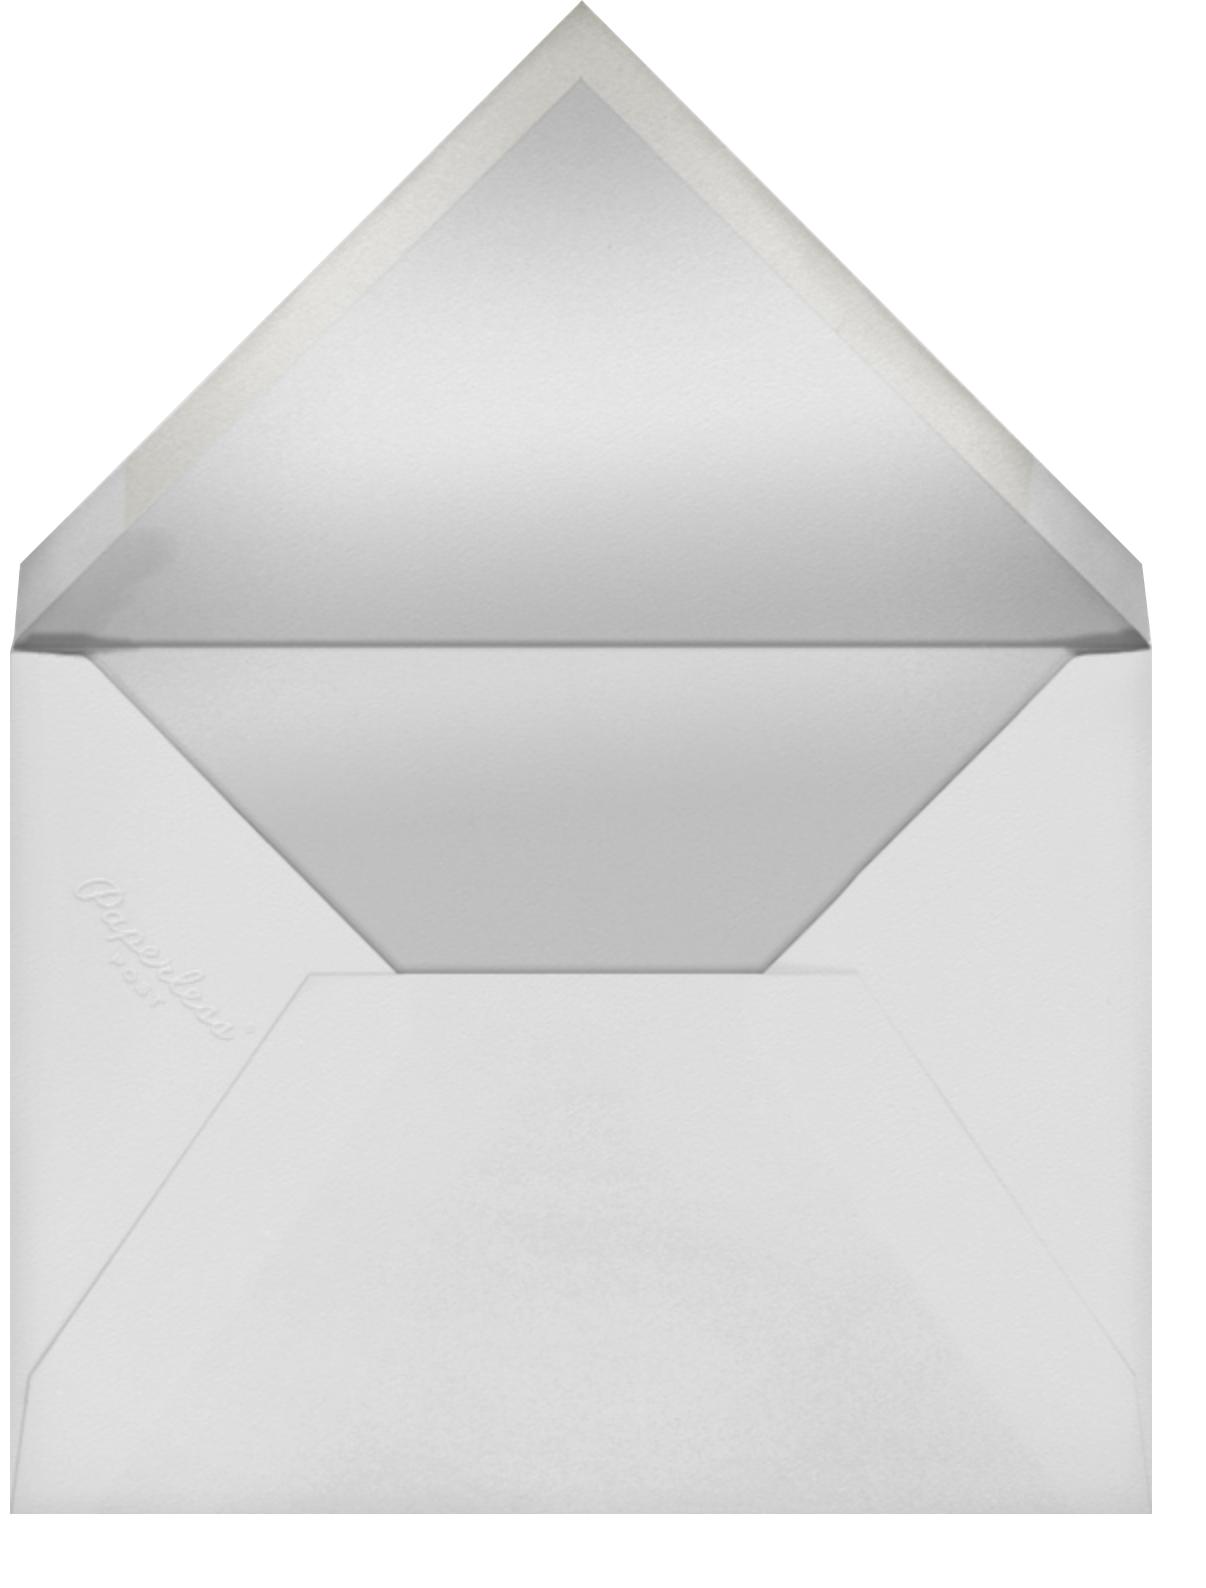 Nissuin (Menu) - Gray - Paperless Post - Menus - envelope back